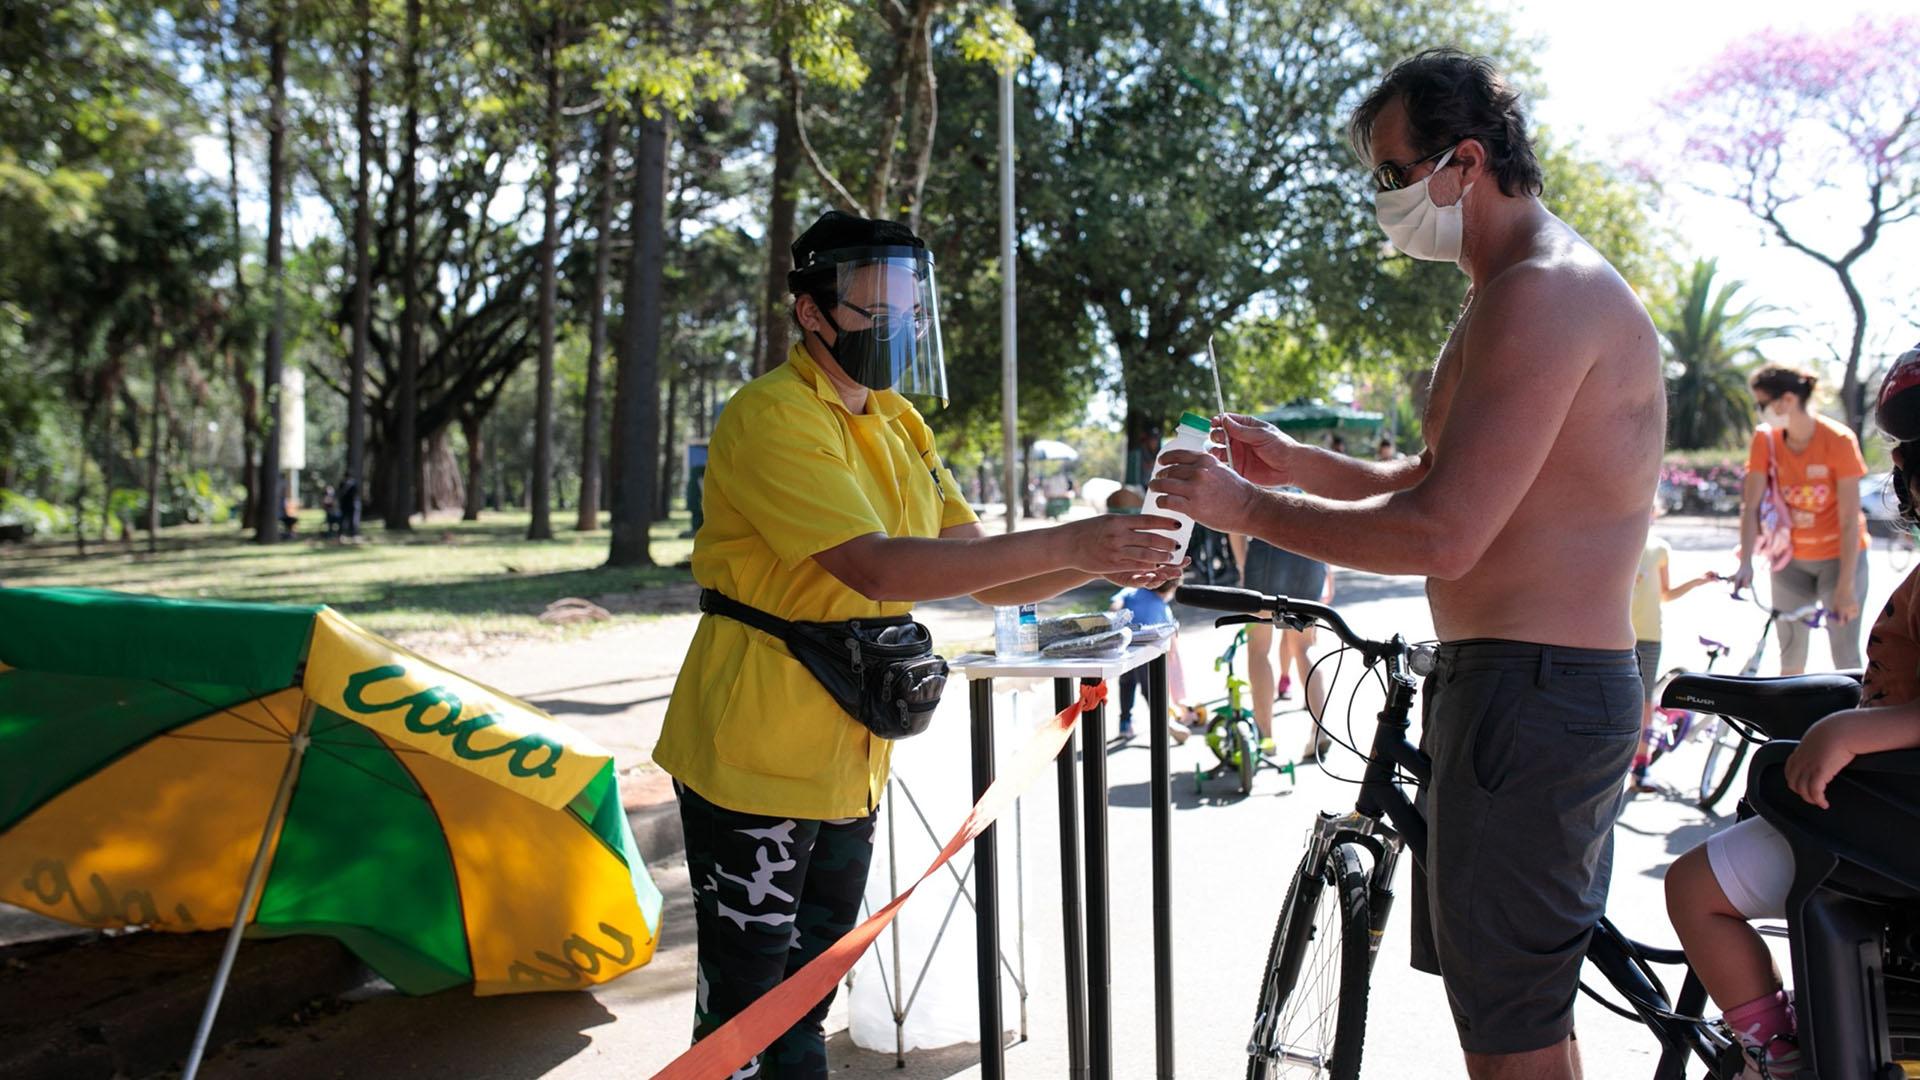 Un hombre se desinfecta las manos en un parque (Patricia Monteiro/Bloomberg)